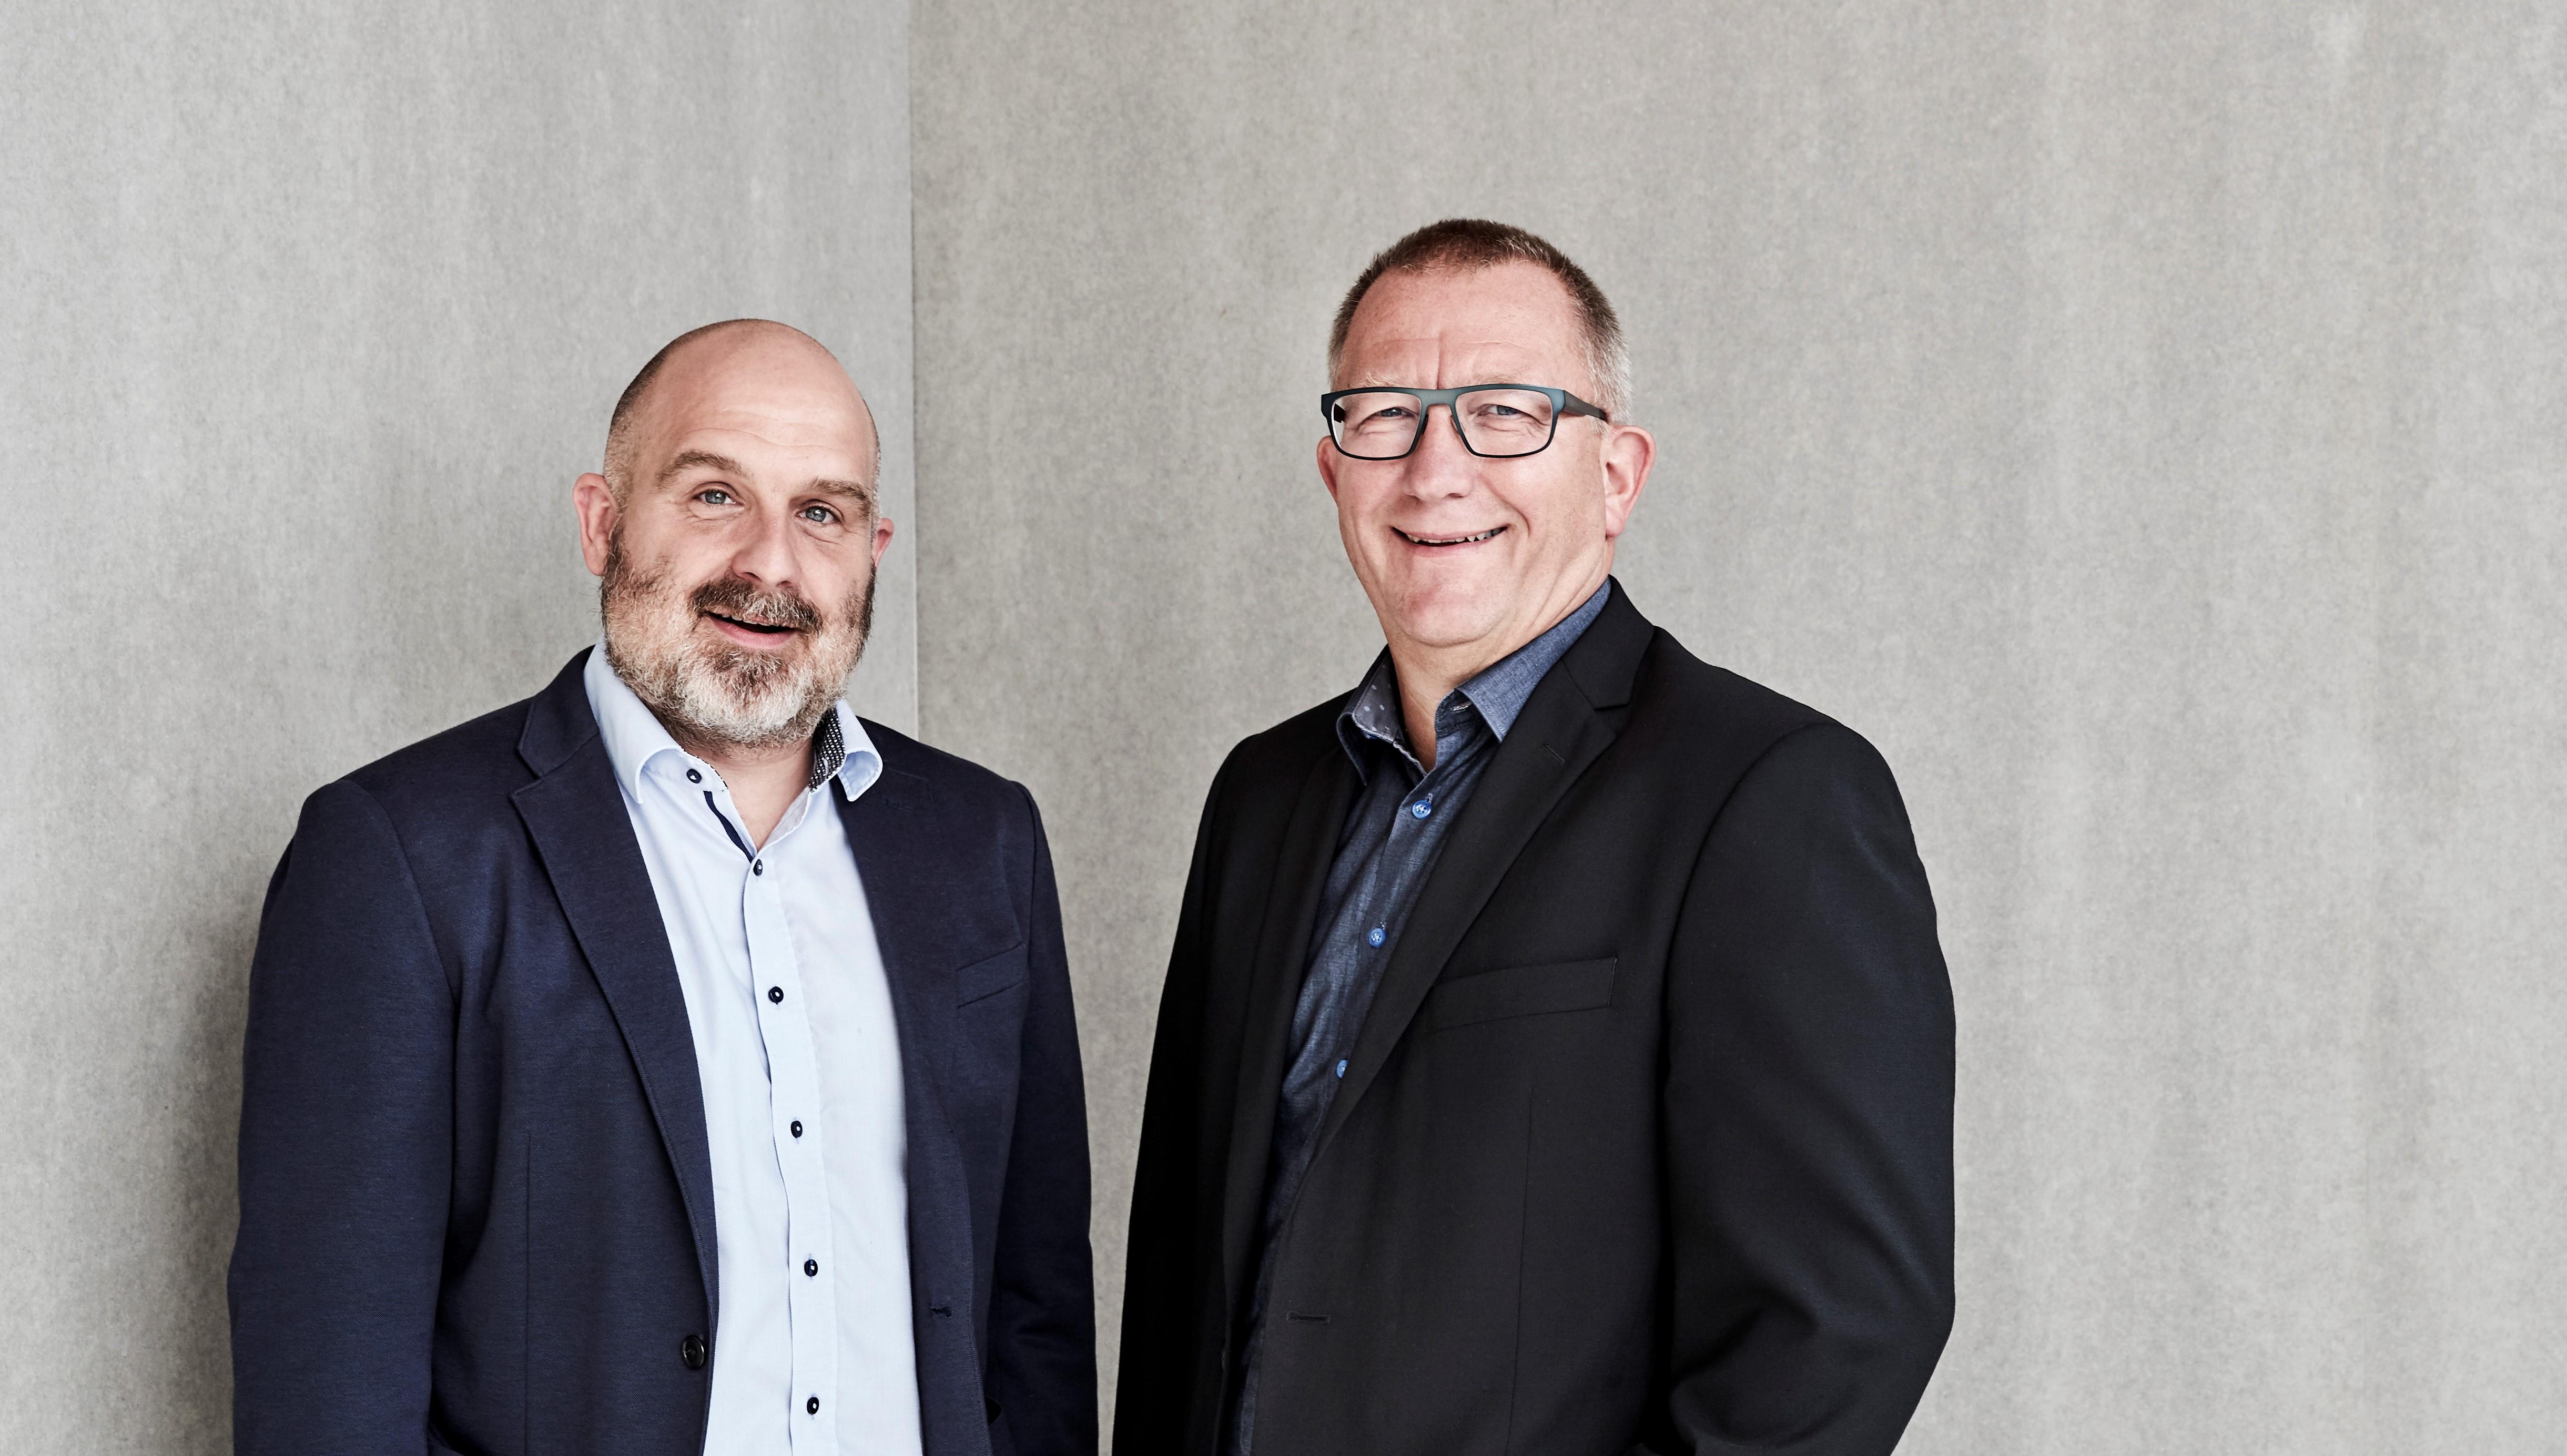 New CEO for ALPI Air & Sea in Denmark